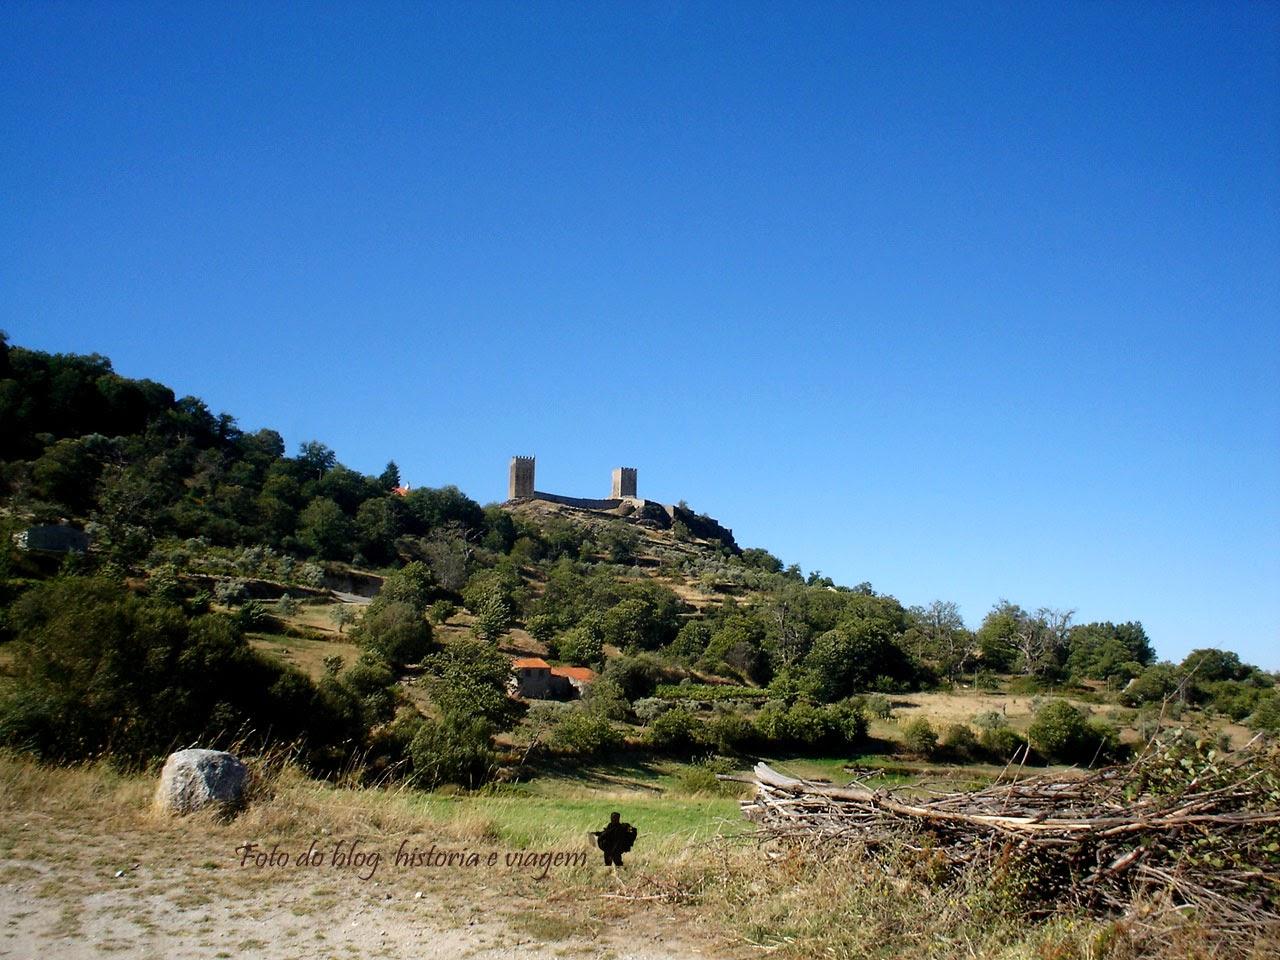 Castelo medieval portugues